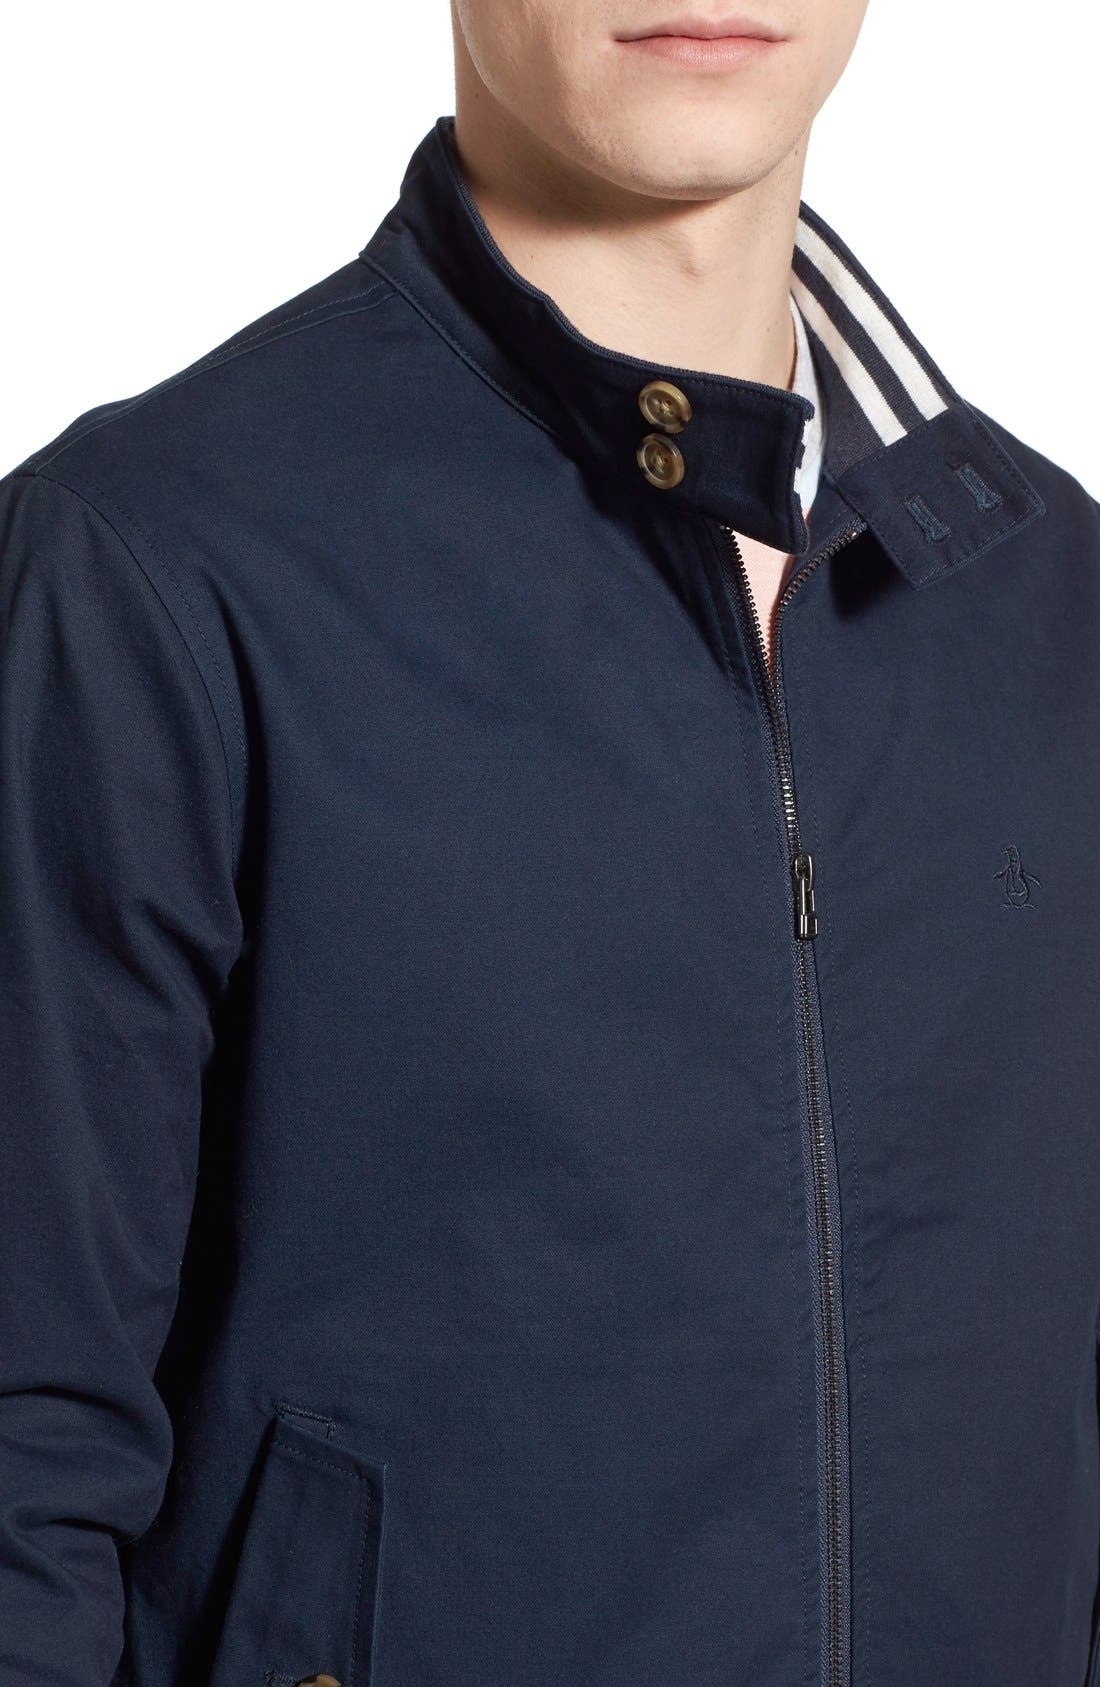 'P55' Harrington Jacket,                             Alternate thumbnail 3, color,                             413